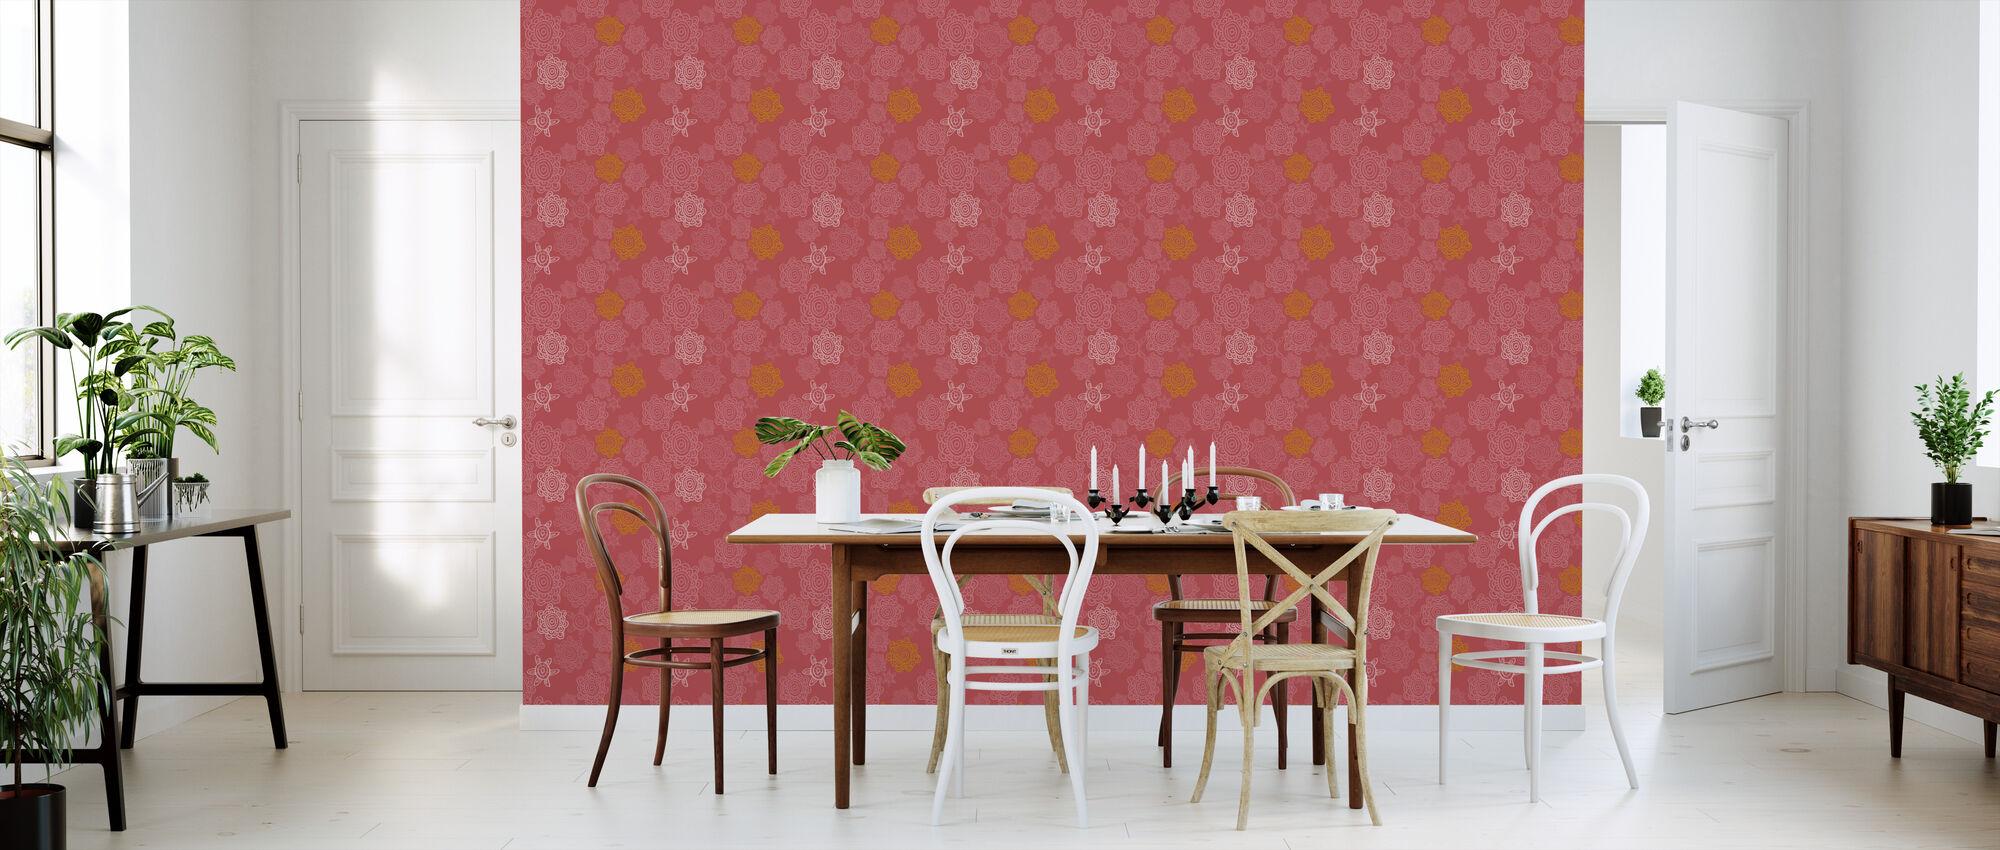 Swirlygirly - Cosy - Wallpaper - Kitchen